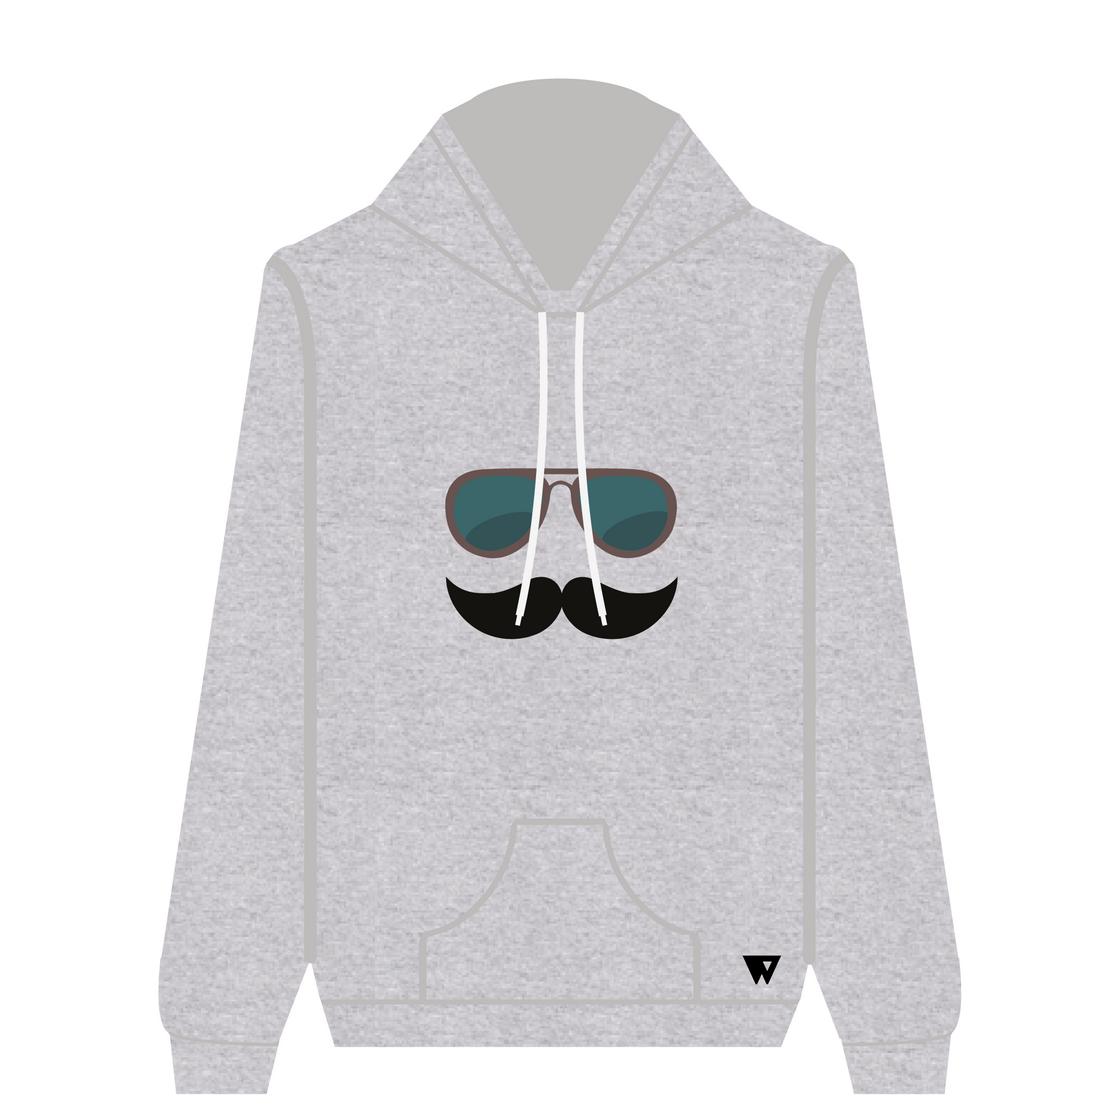 Hoodie Mustache Glasses | Wuzzee